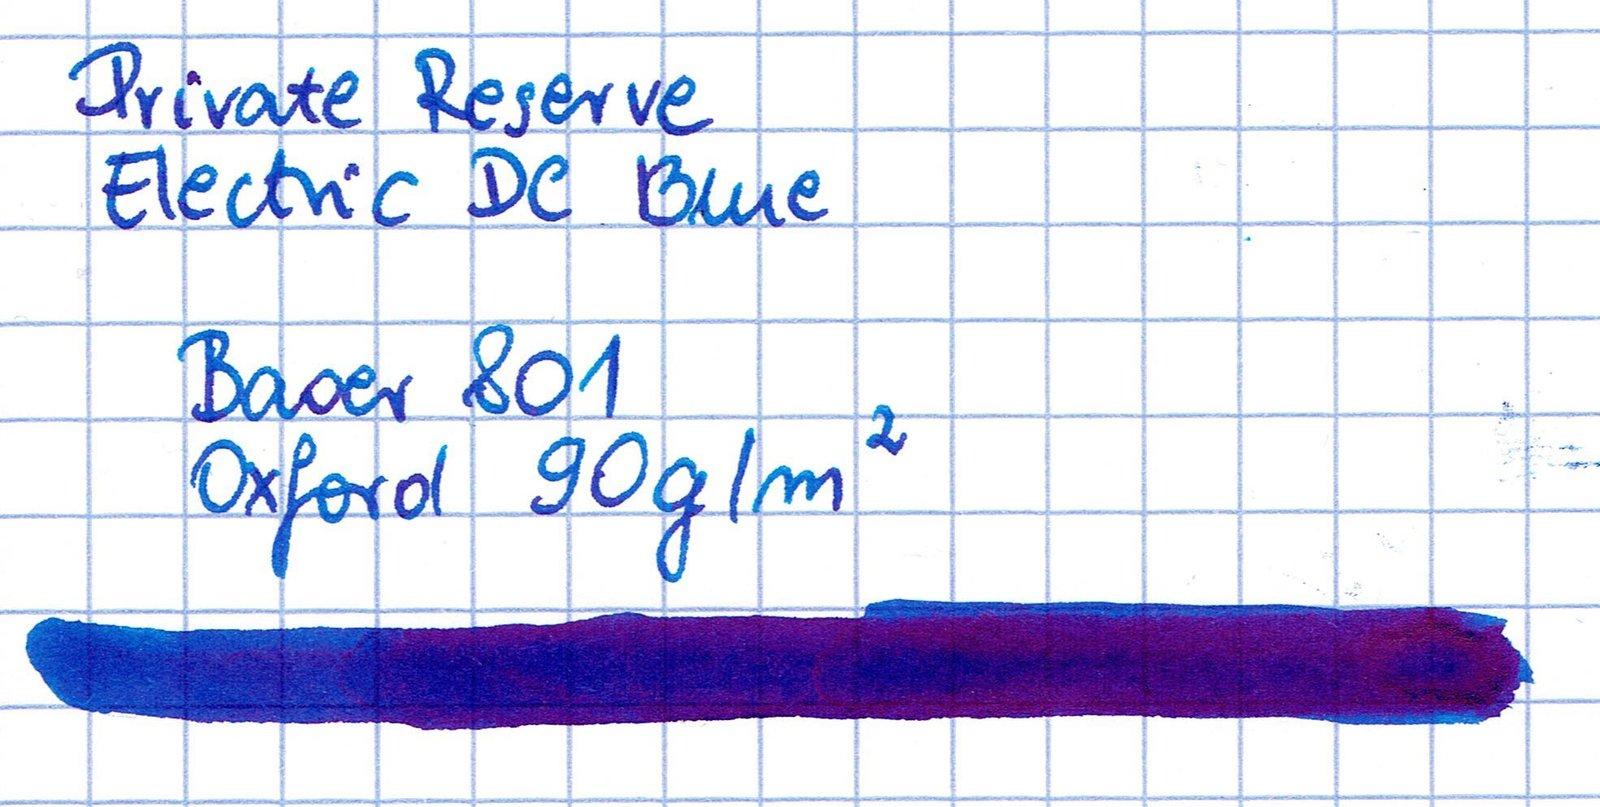 large.5a8349b93ffef_PrivateReserveElectricDCBlueOxford.jpg.ea114ce3992e8e81e3f0d0074c3cb5f9.jpg